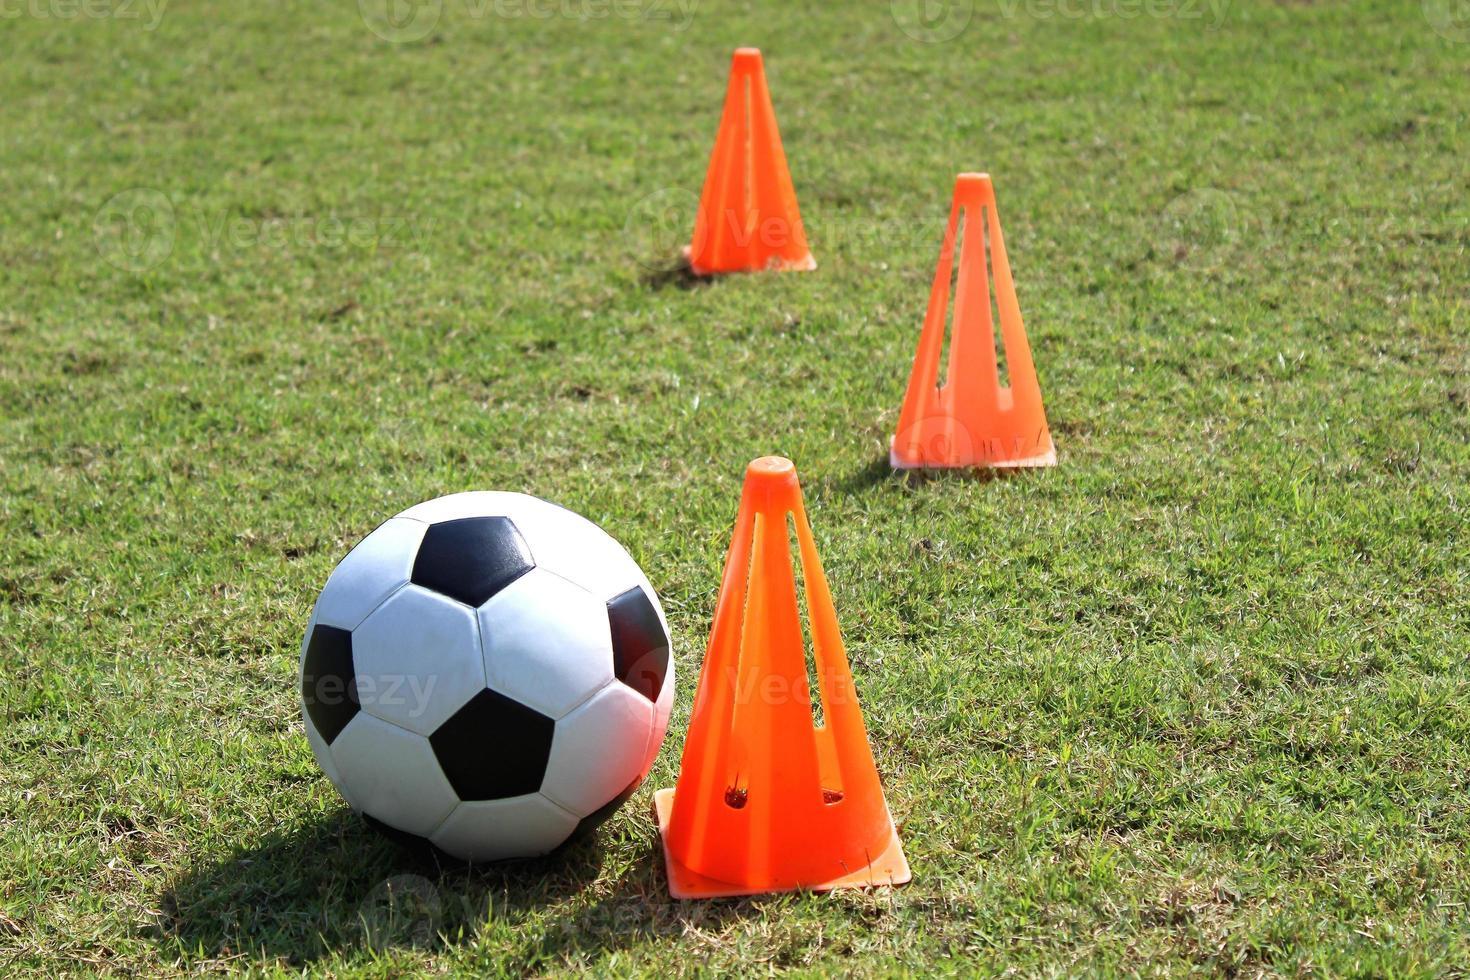 Fußballtraining foto